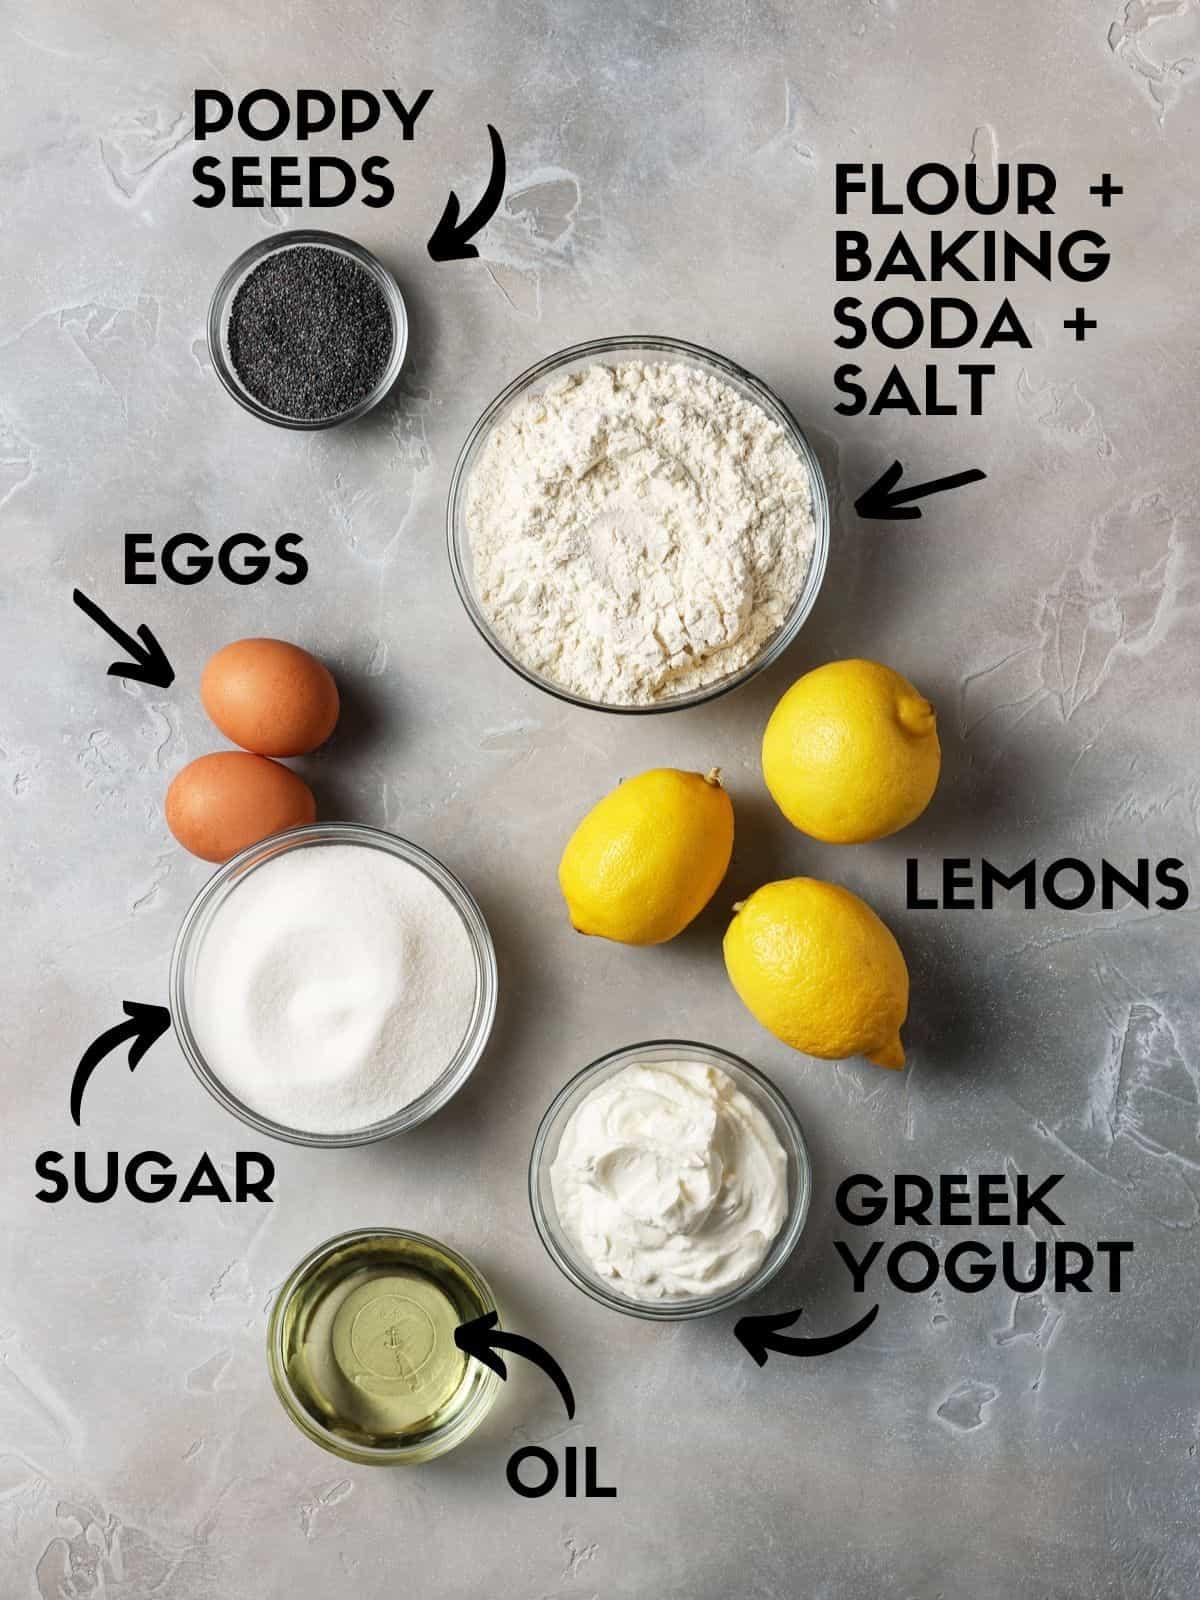 Ingredients for lemon poppy seed bread made with greek yogurt.